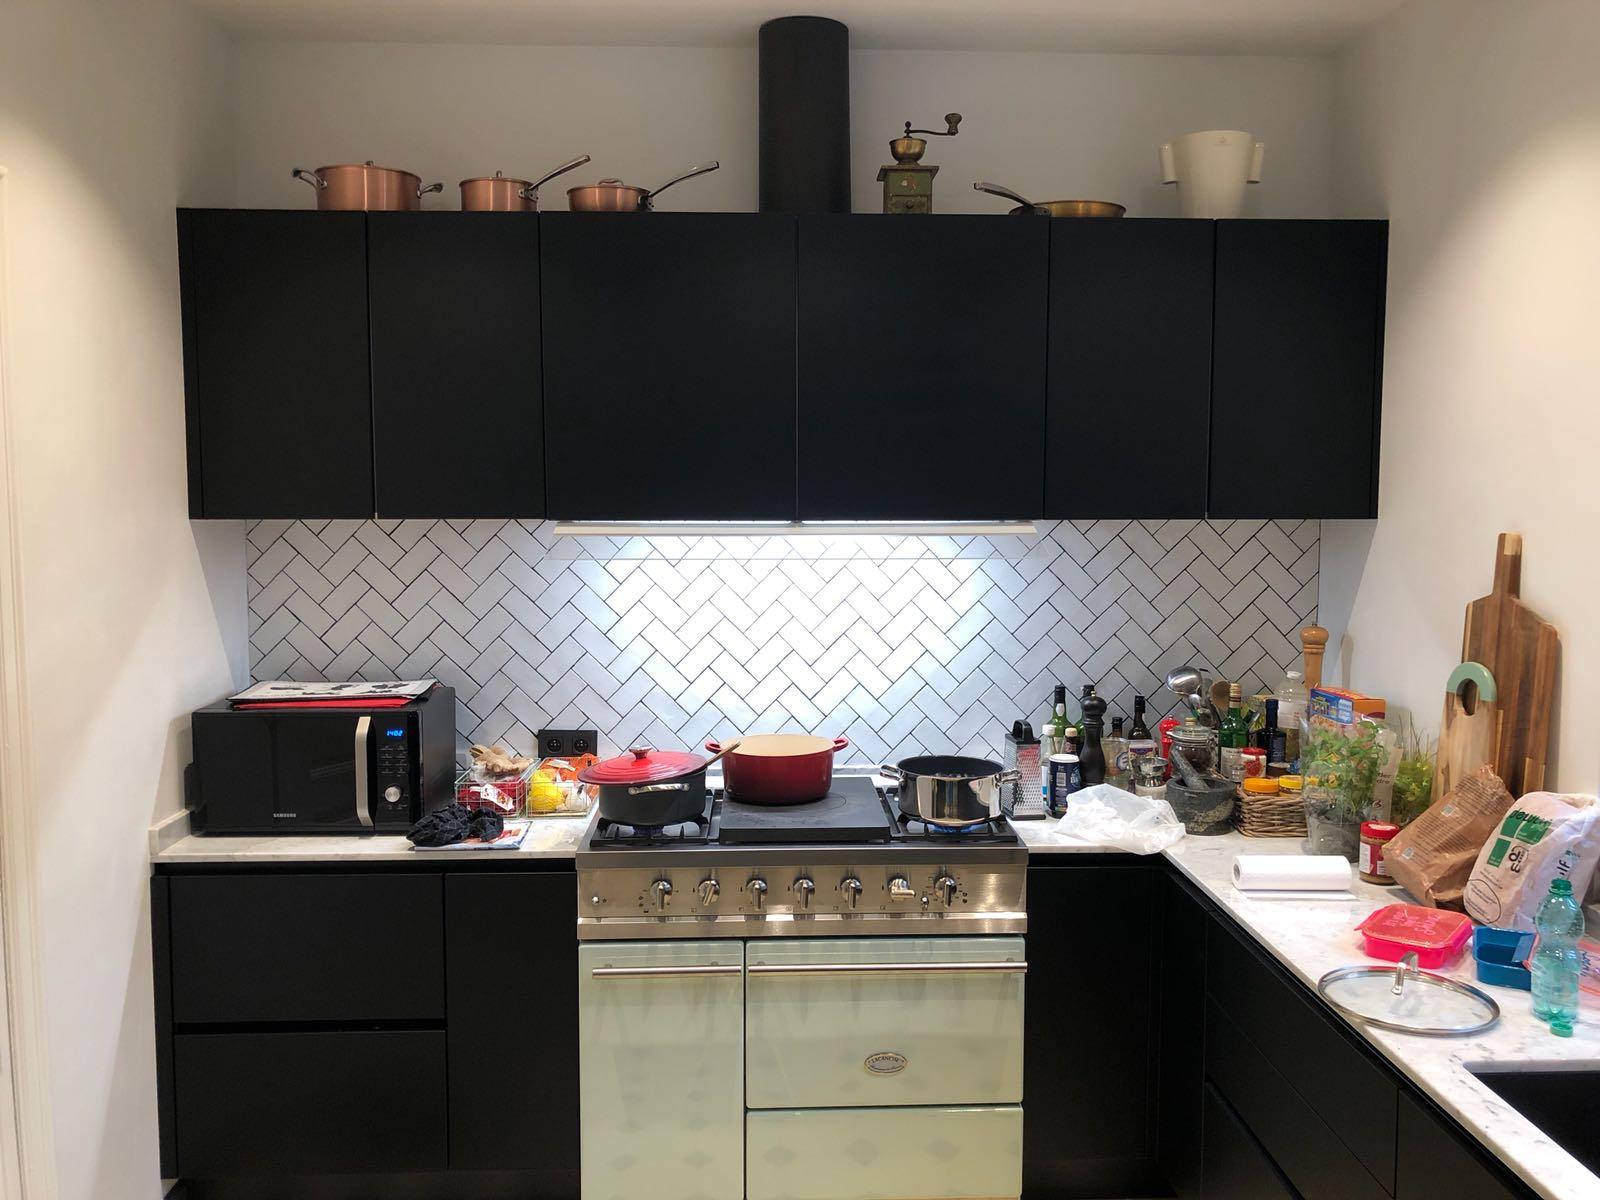 Eggo keukens ervaringen ervaringen eggo keukens